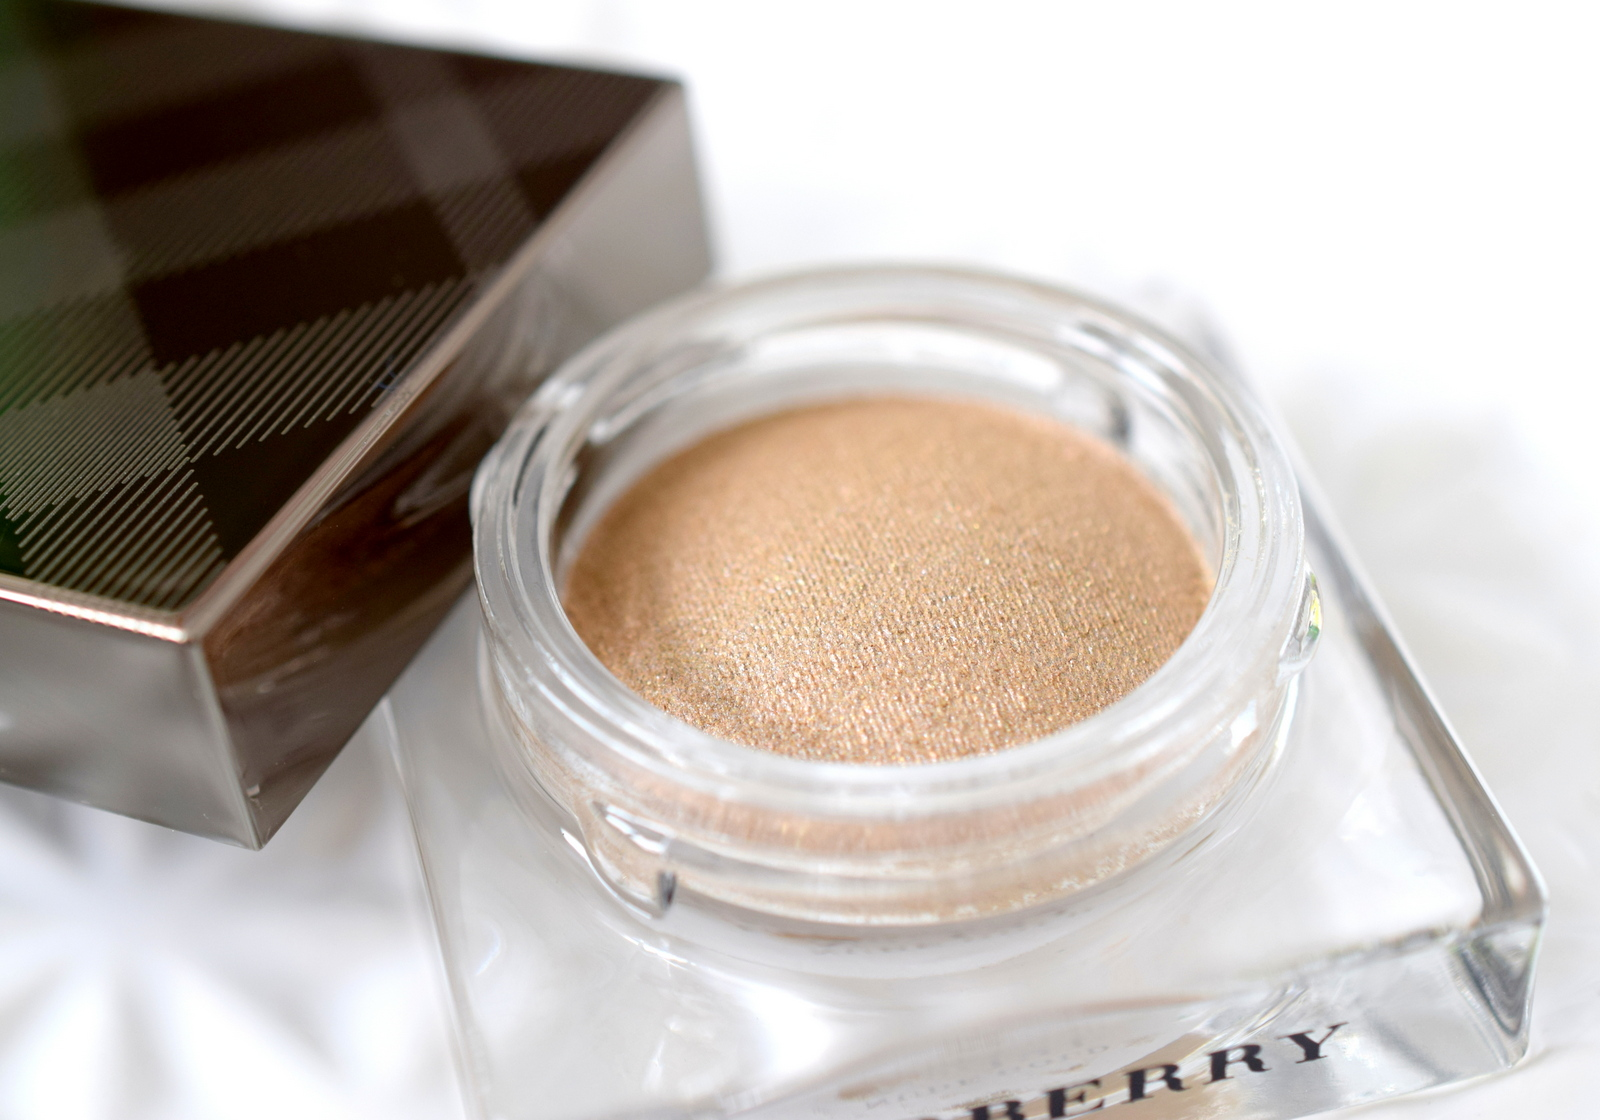 burberry-velvet-lace-review-eye-color-cream-2